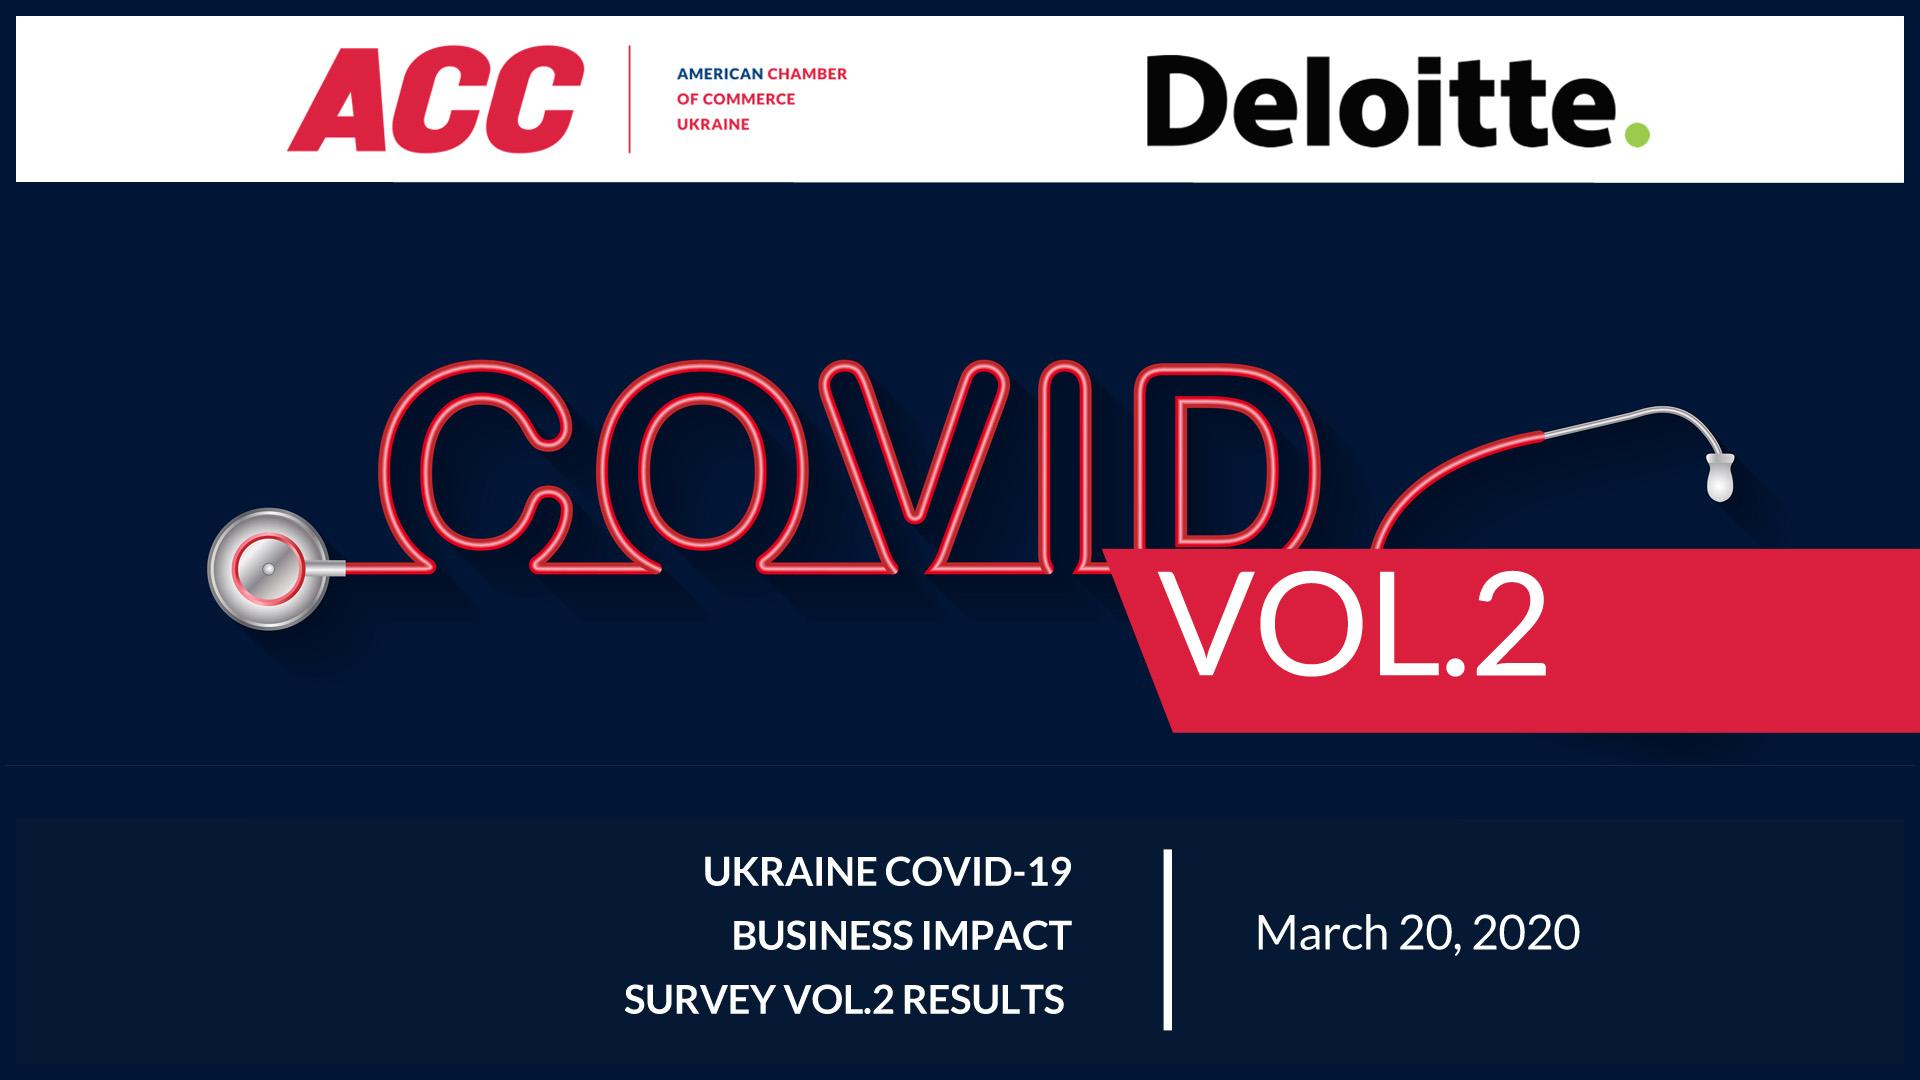 Ukraine COVID-19 Business Impact Survey Vol.2 Results